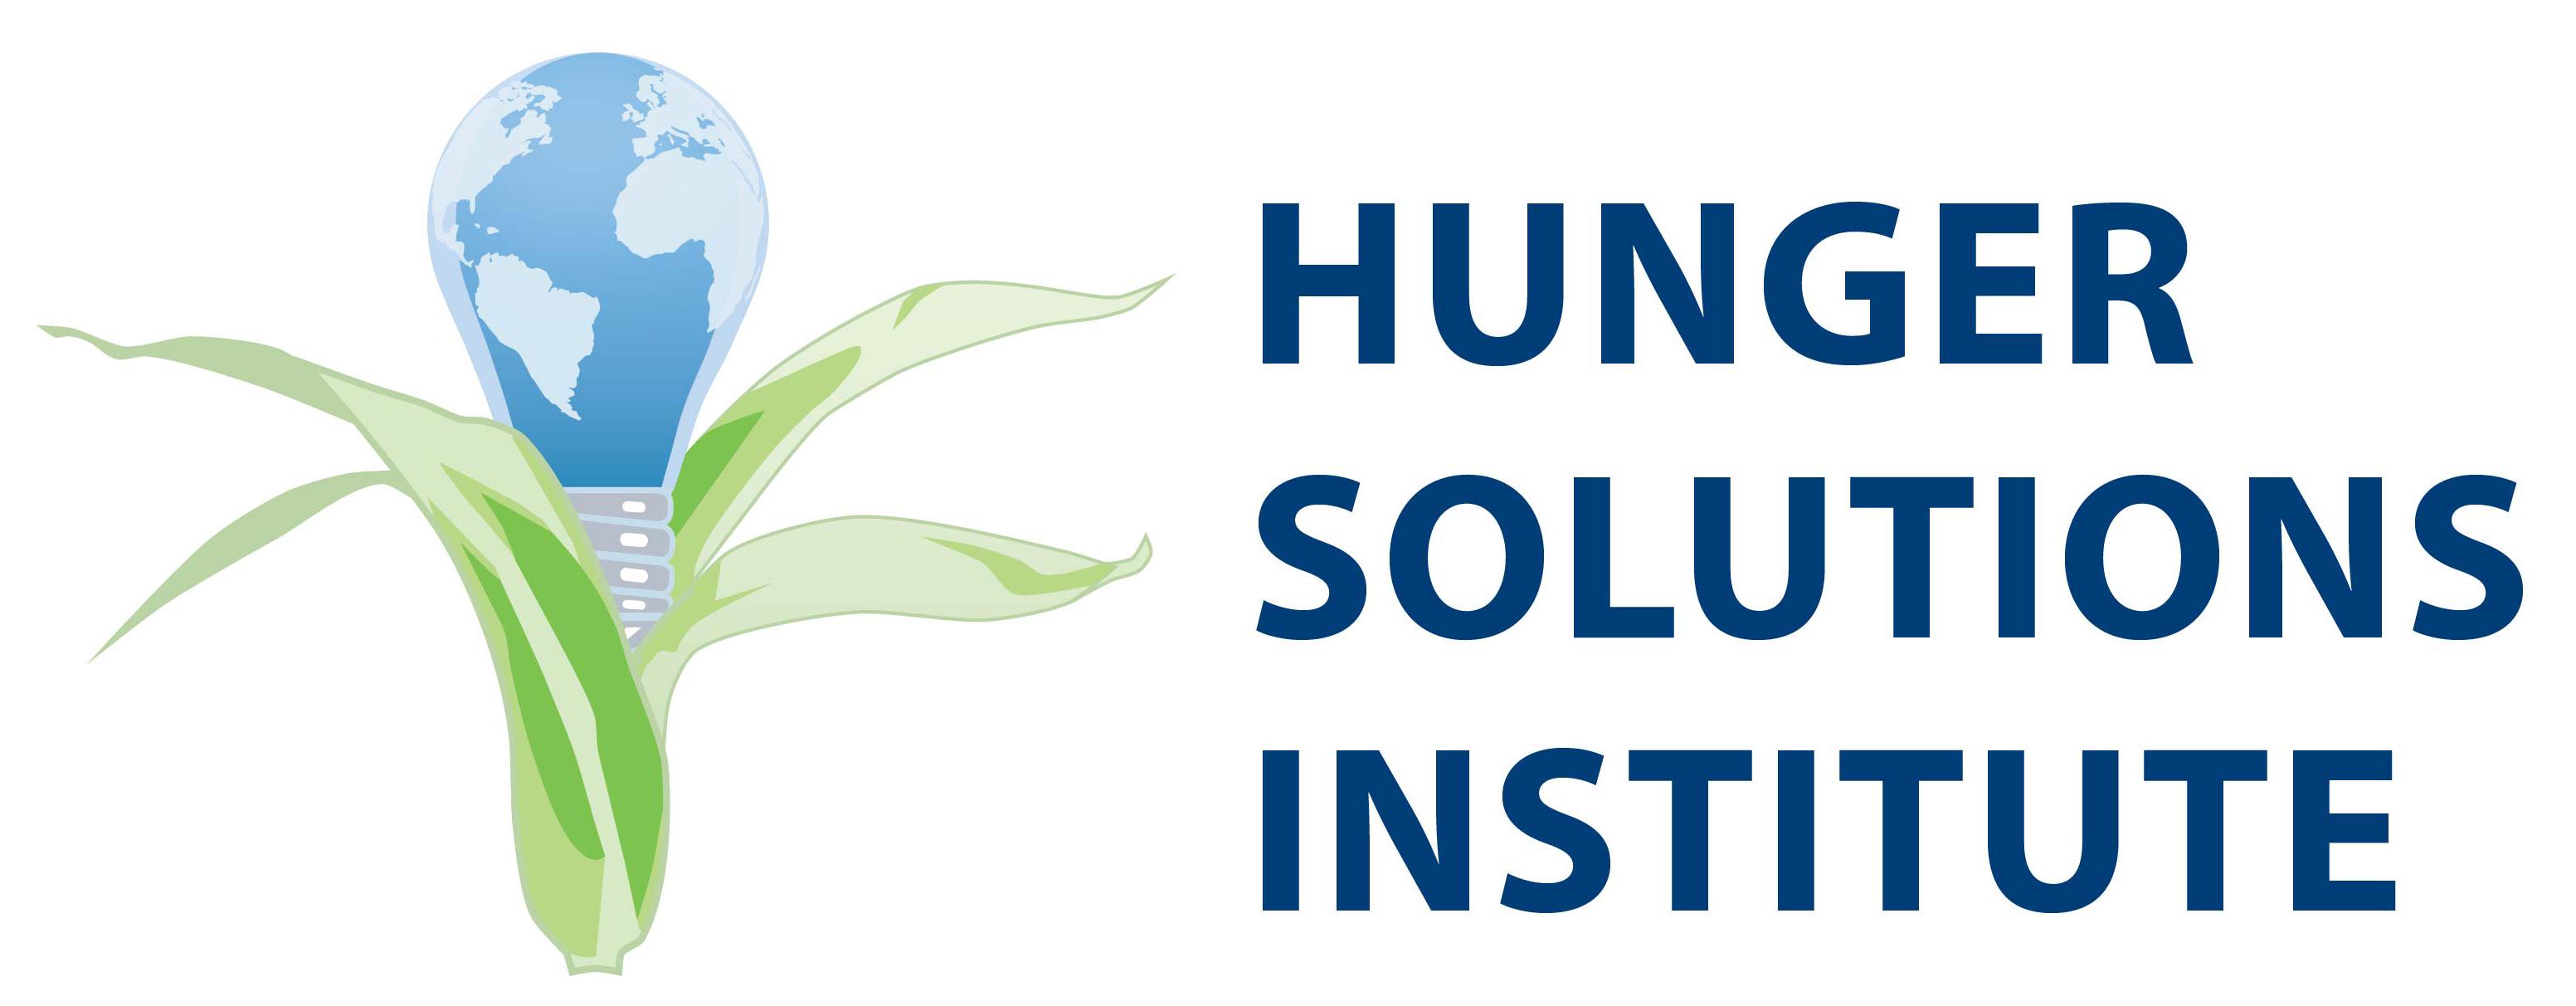 HSI_Logo_Text_WHITE.jpg